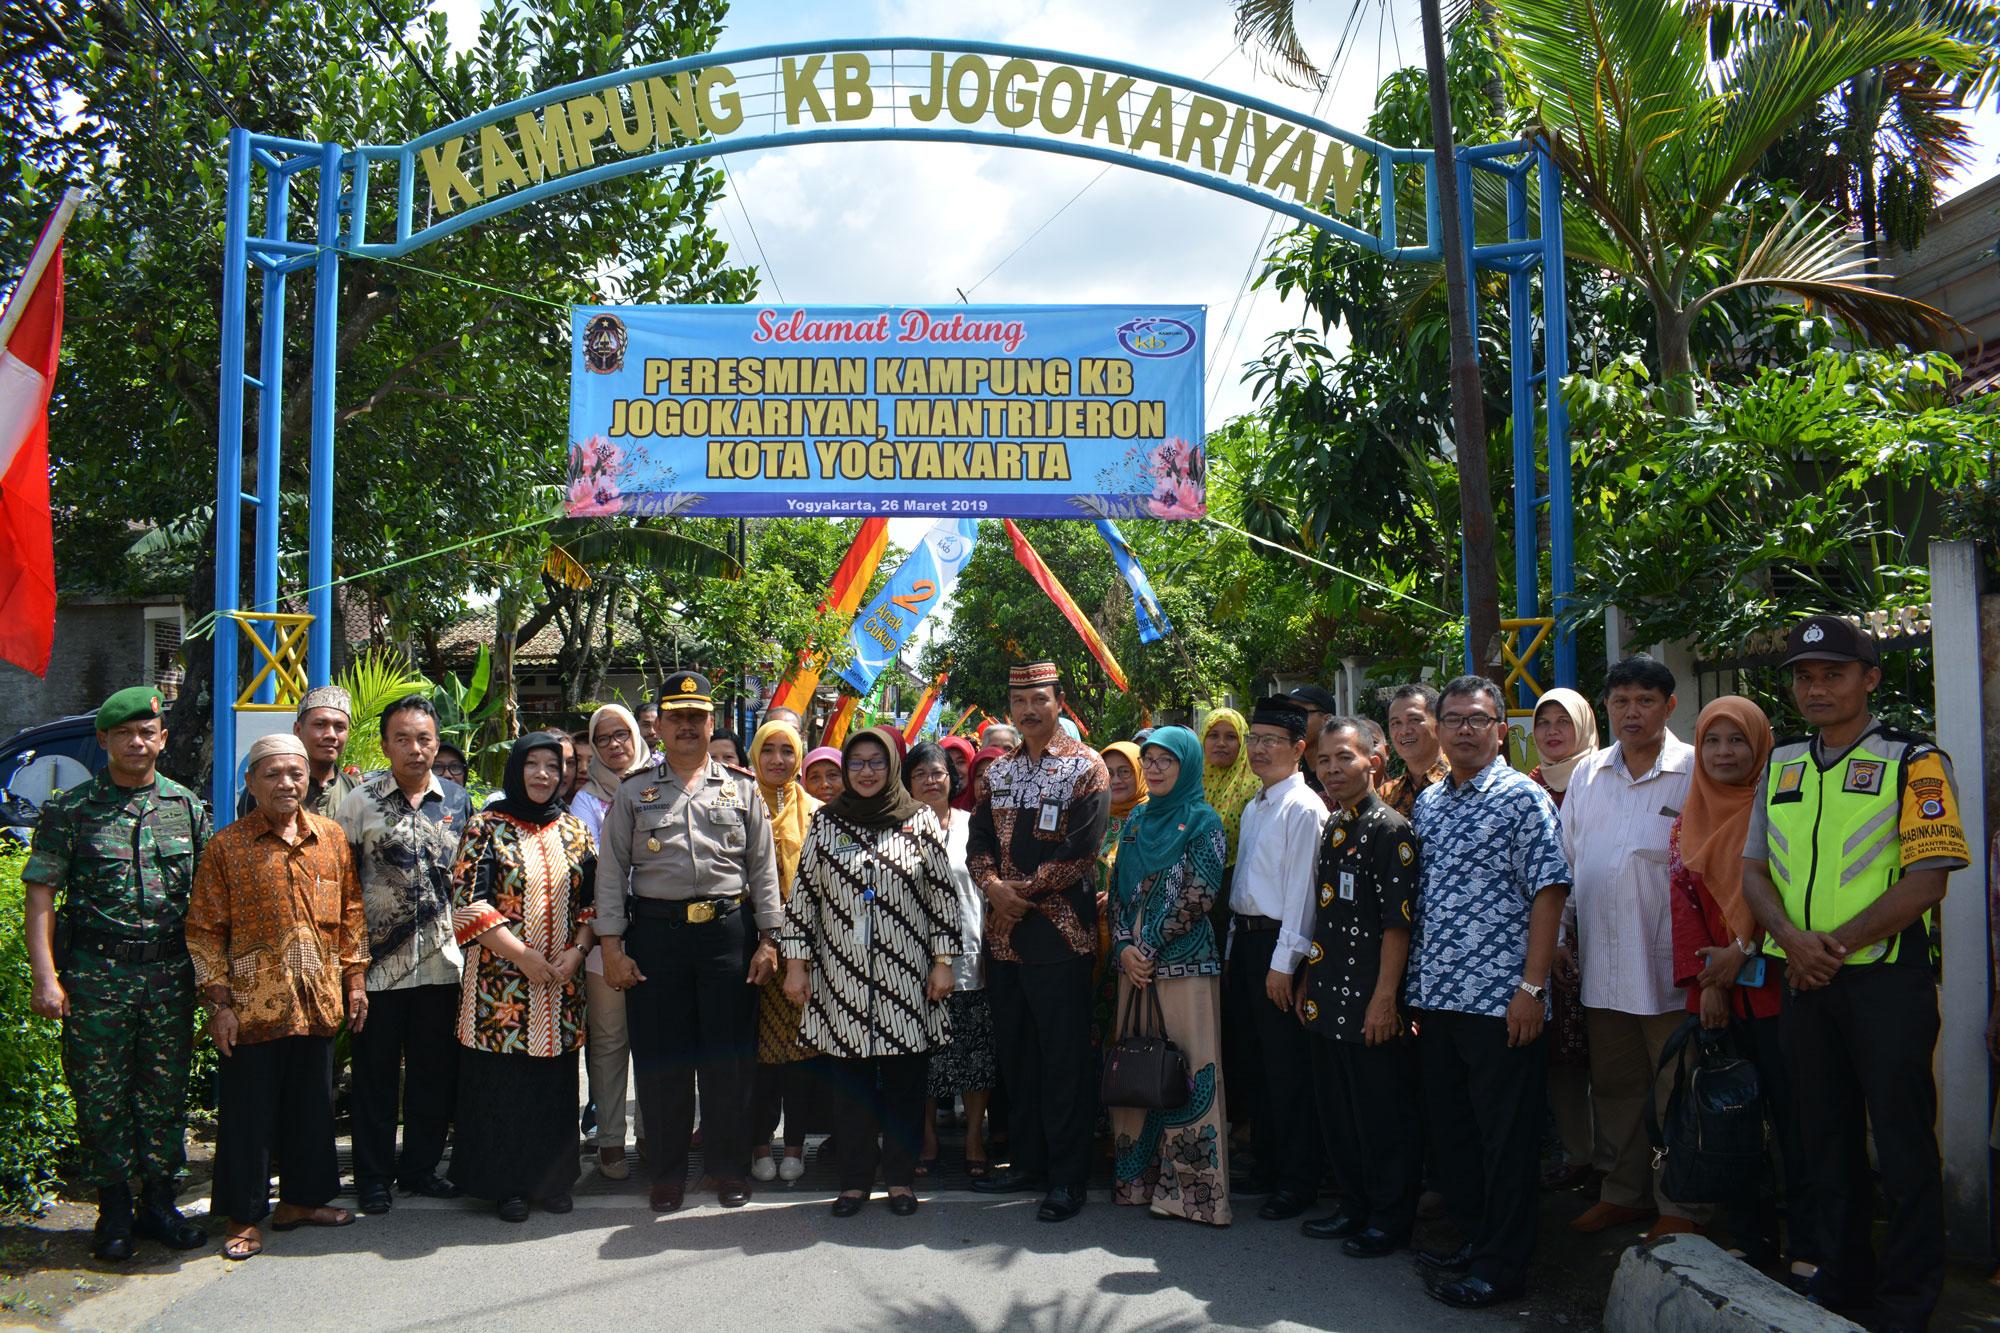 Peresmian Kampung KB Jogokaryan